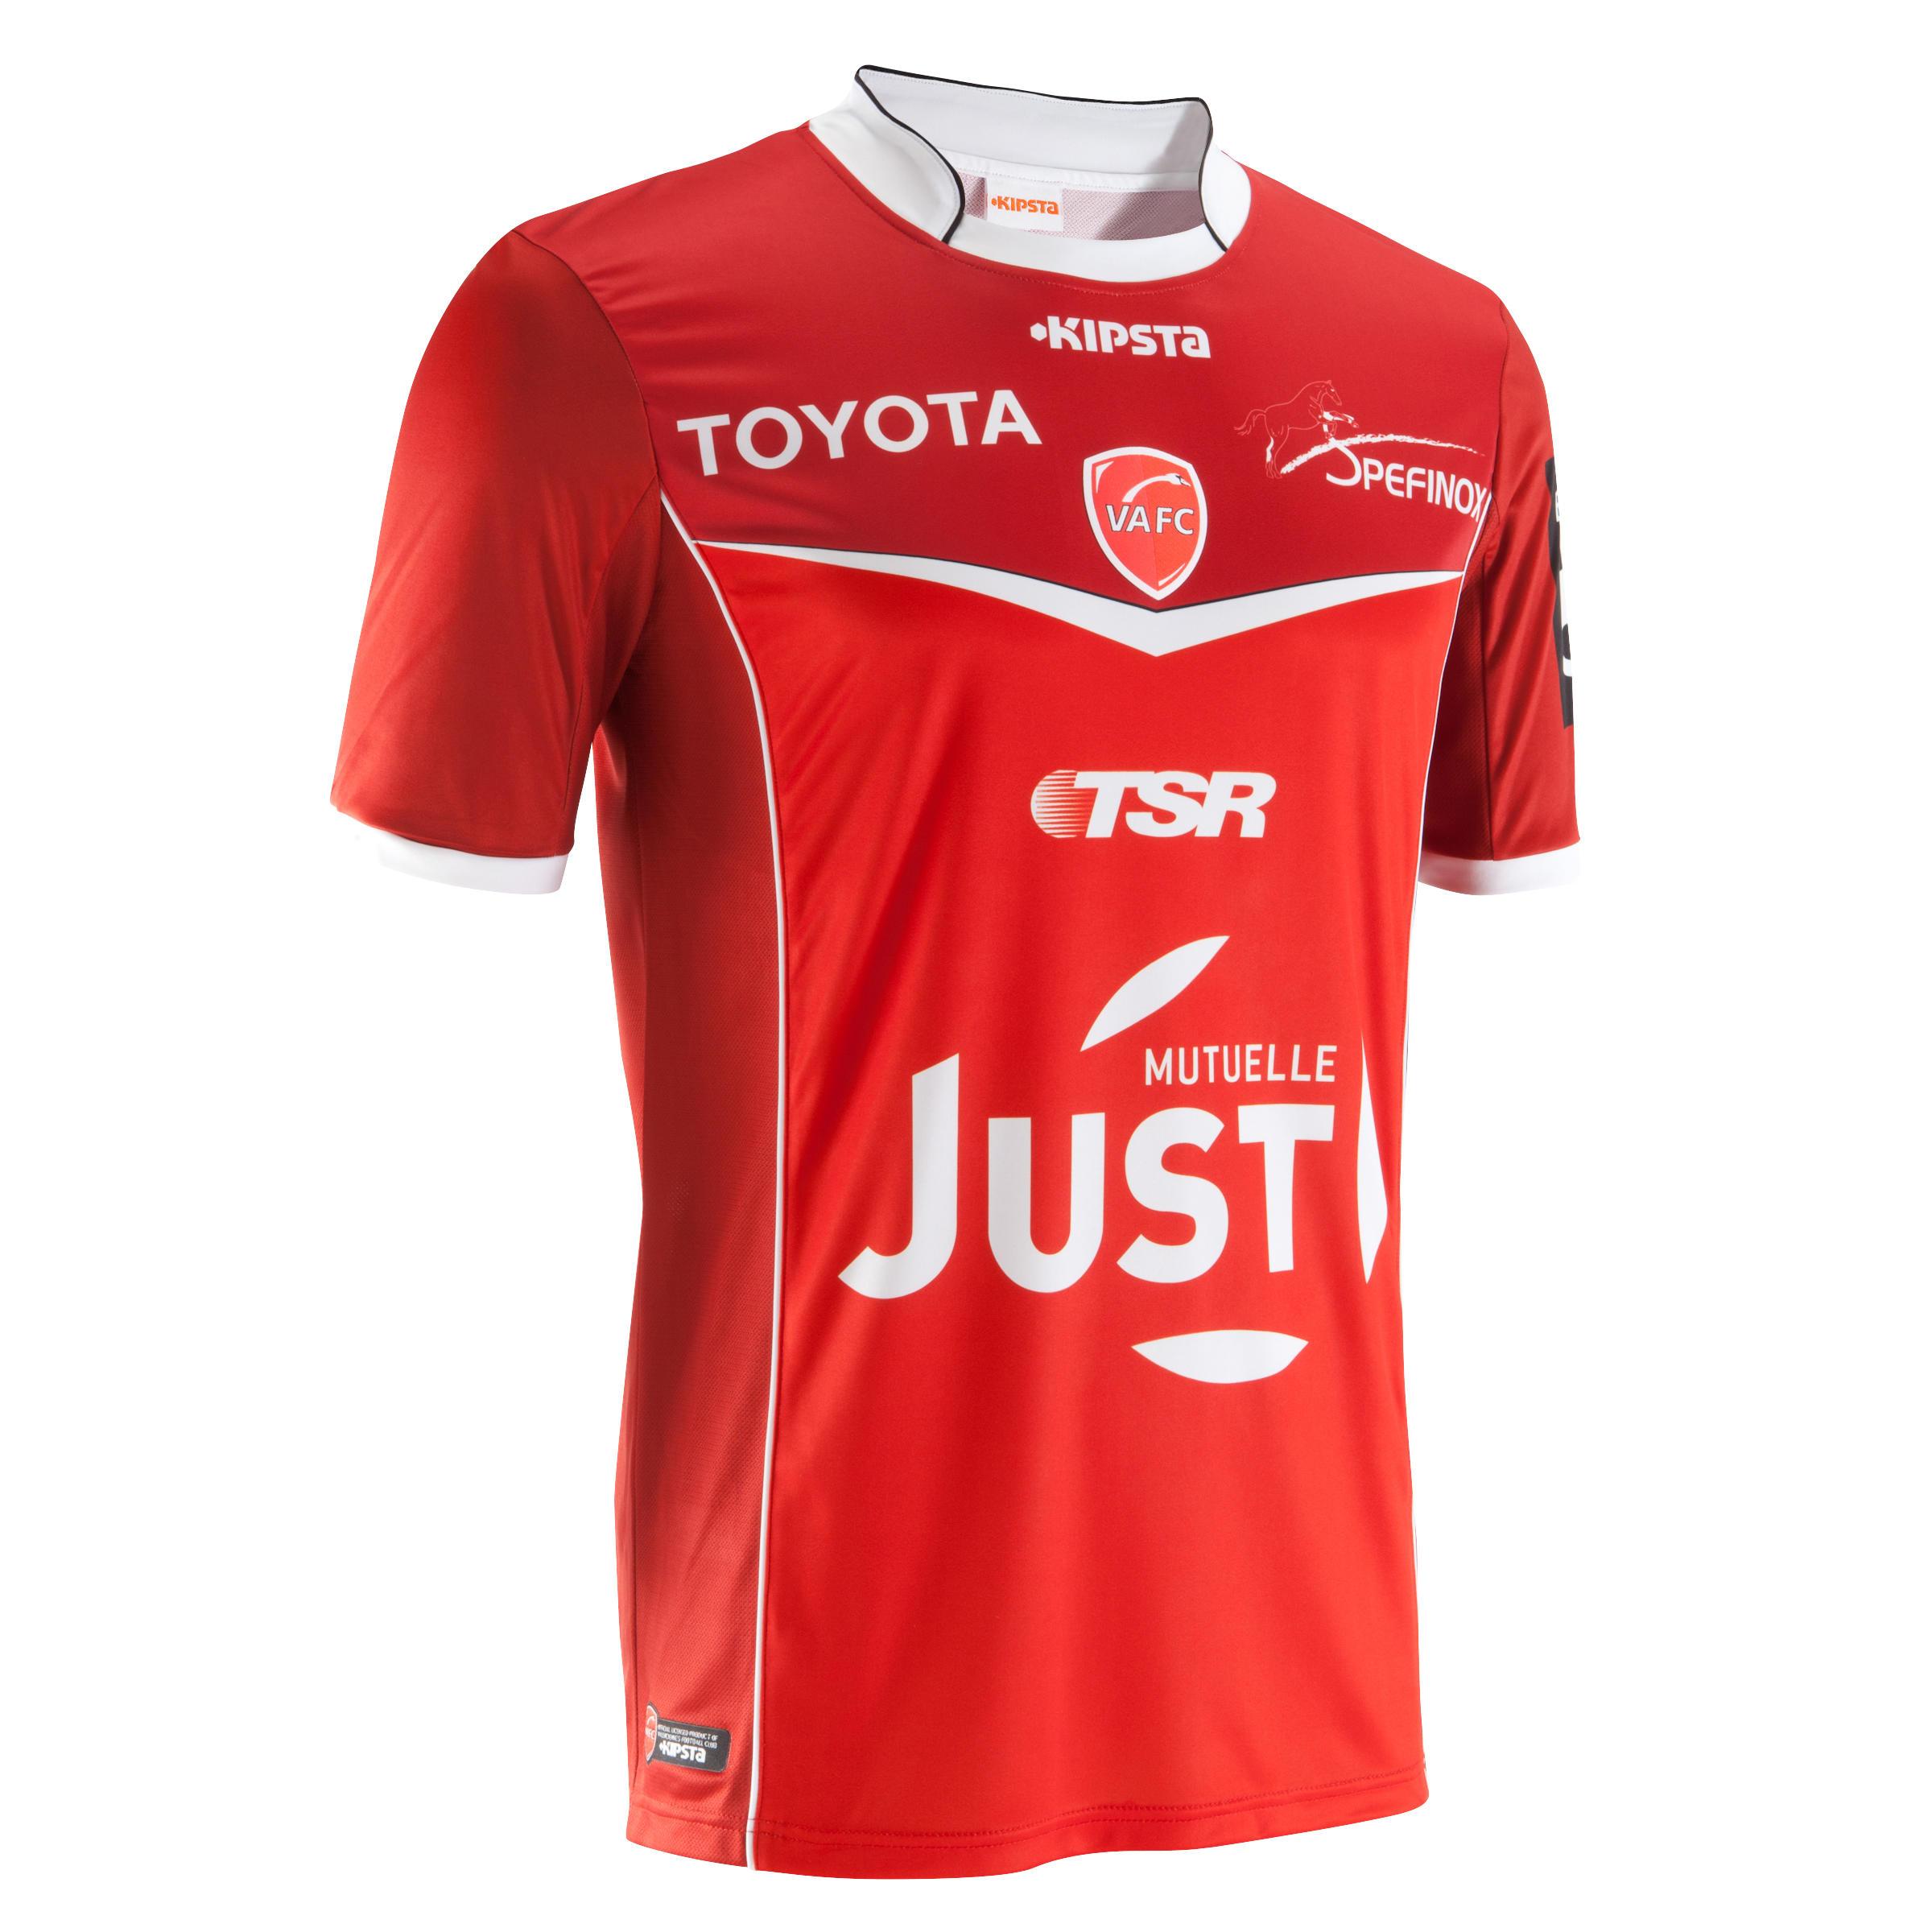 Kipsta Replica voetbalshirt VAFC thuisshirt 2016-2017 kinderen thumbnail